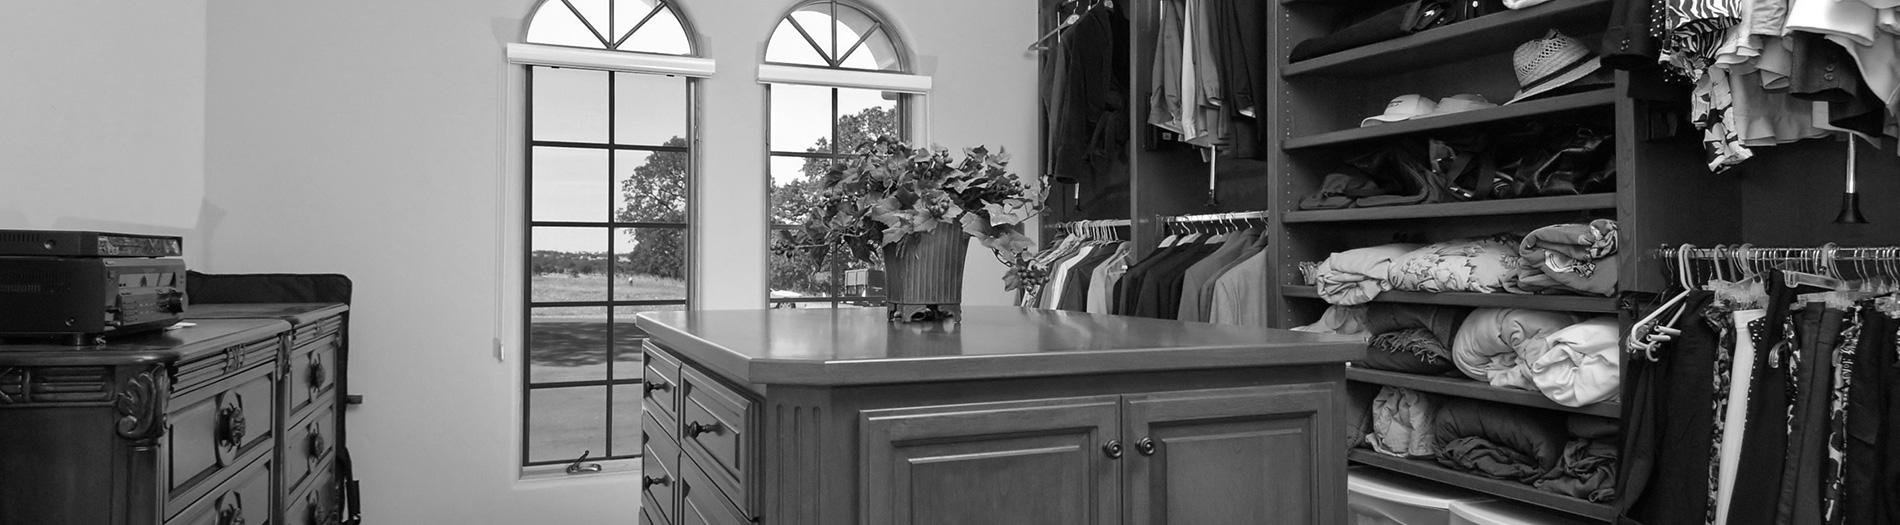 st-charles-closets-banner-4-gray